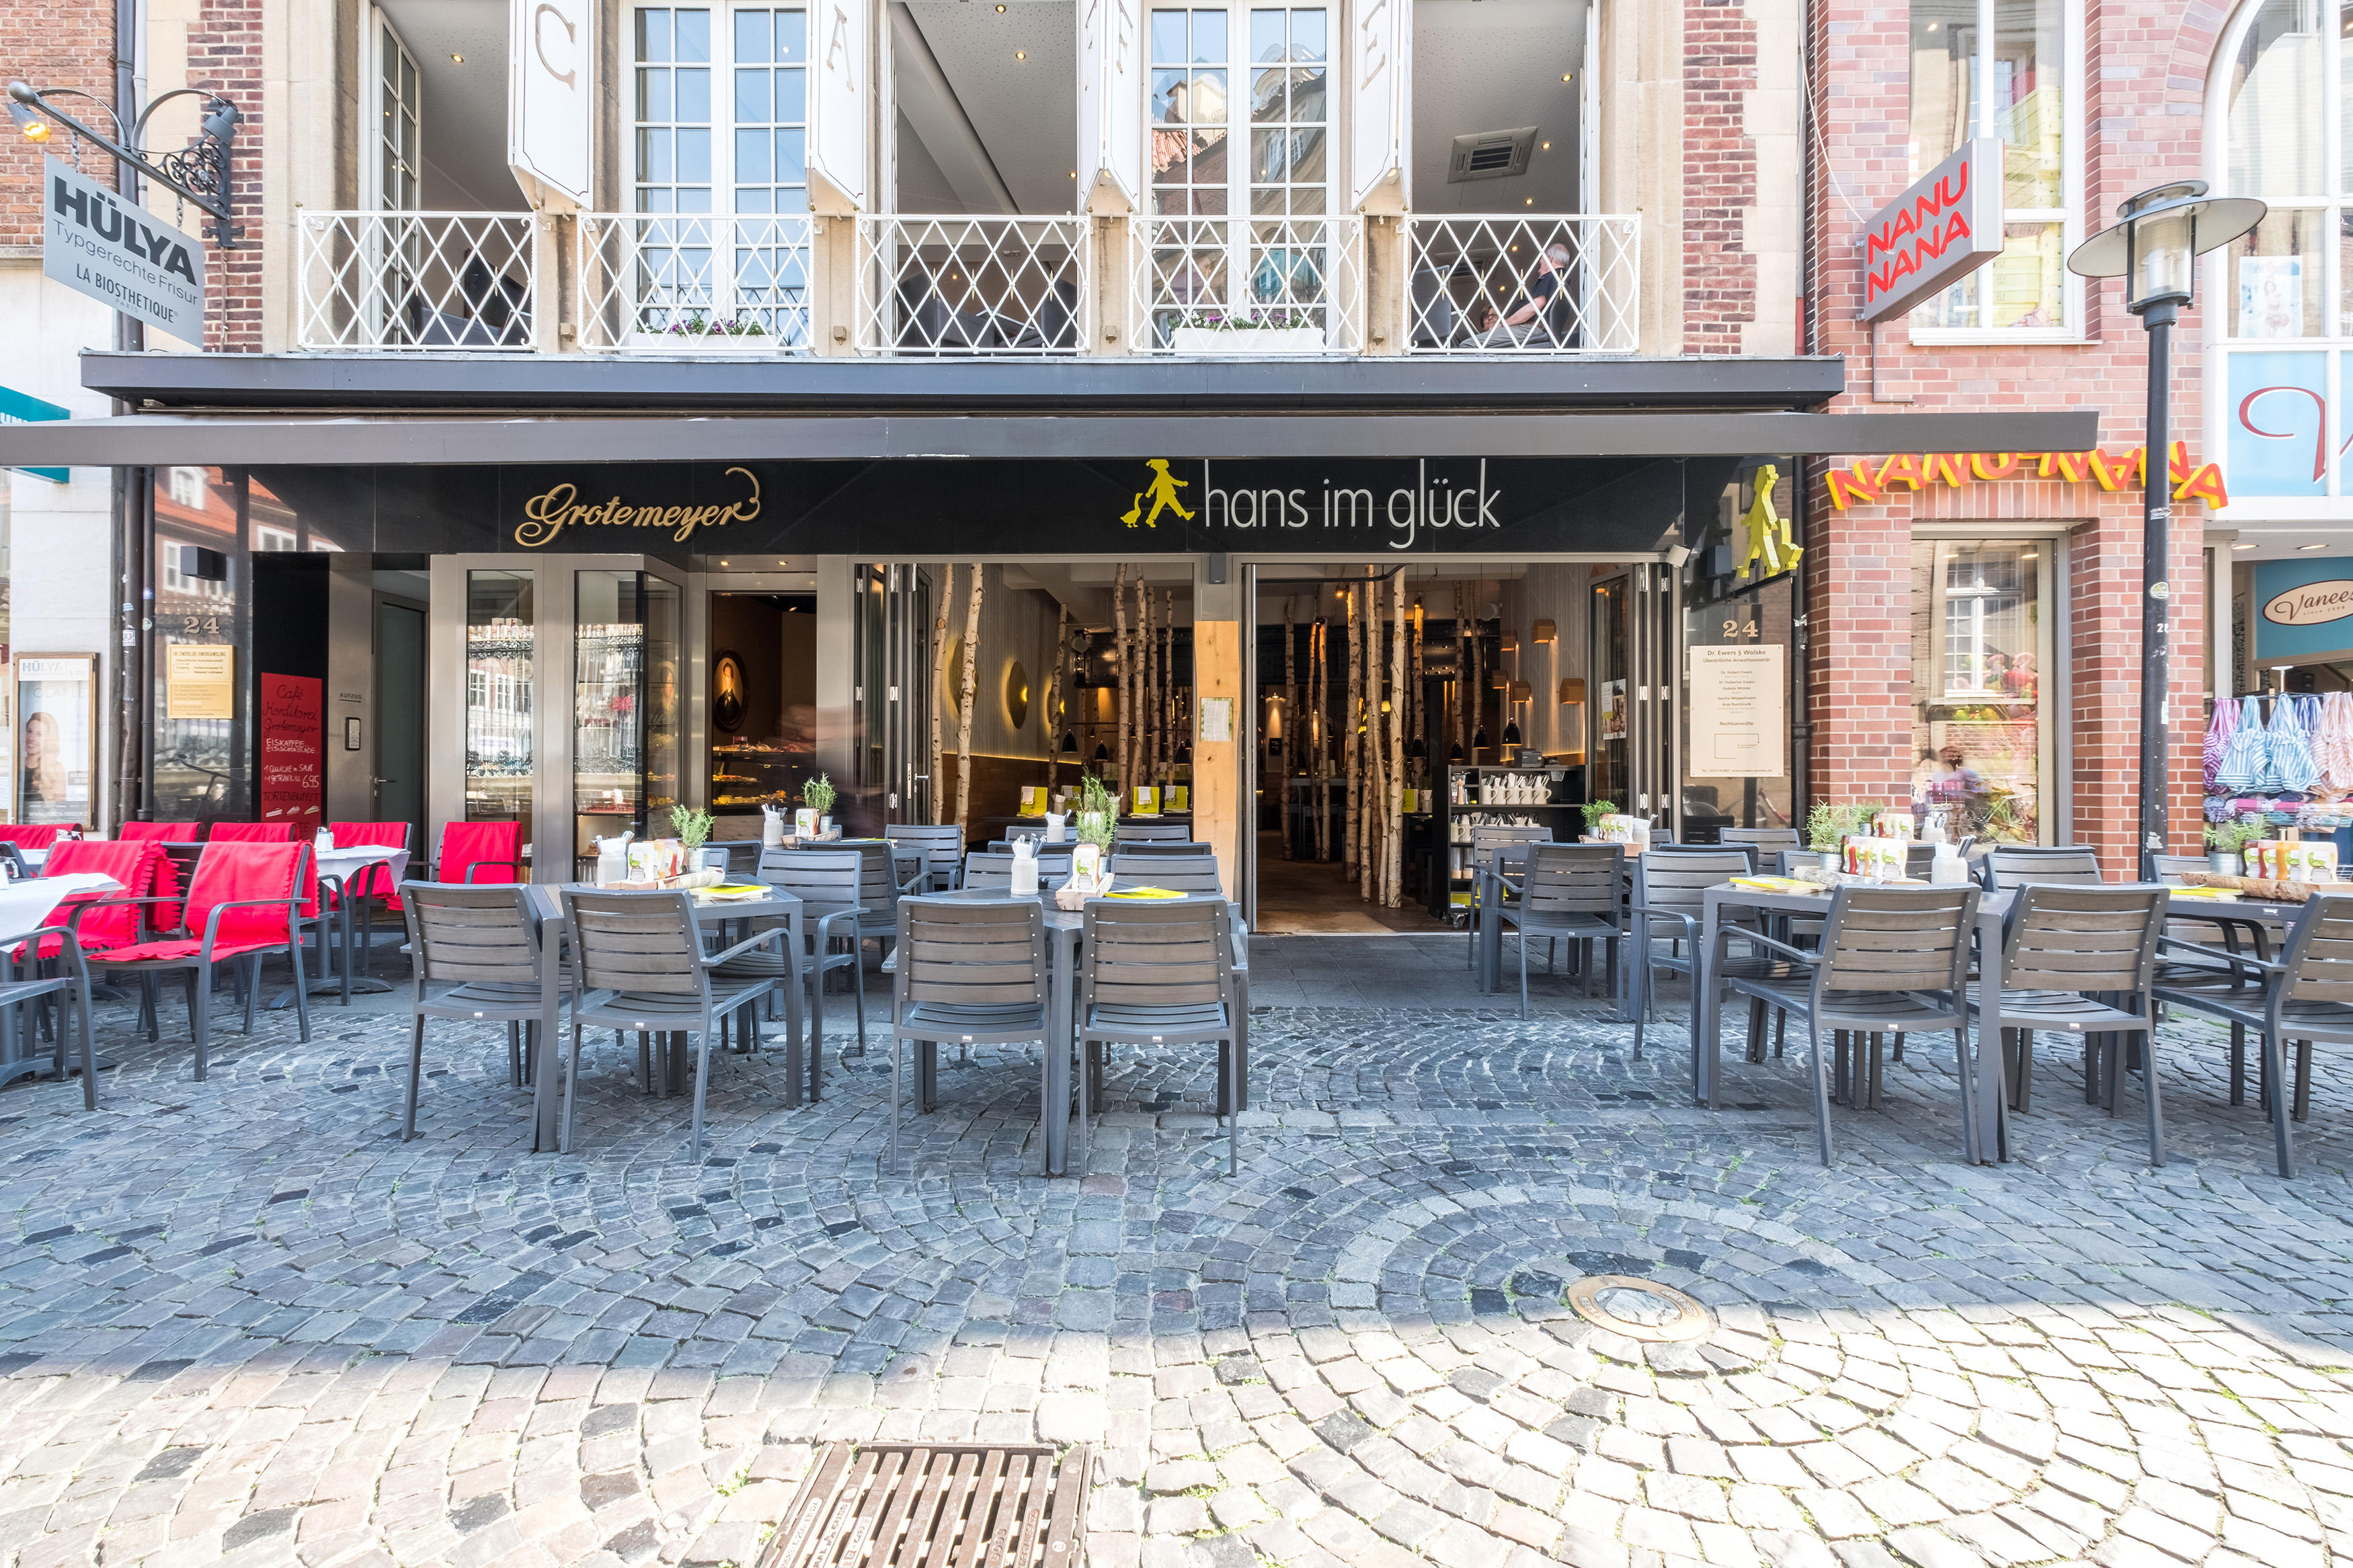 HANS IM GLÜCK Burgergrill & Bar, Salzstraße 24 in Münster